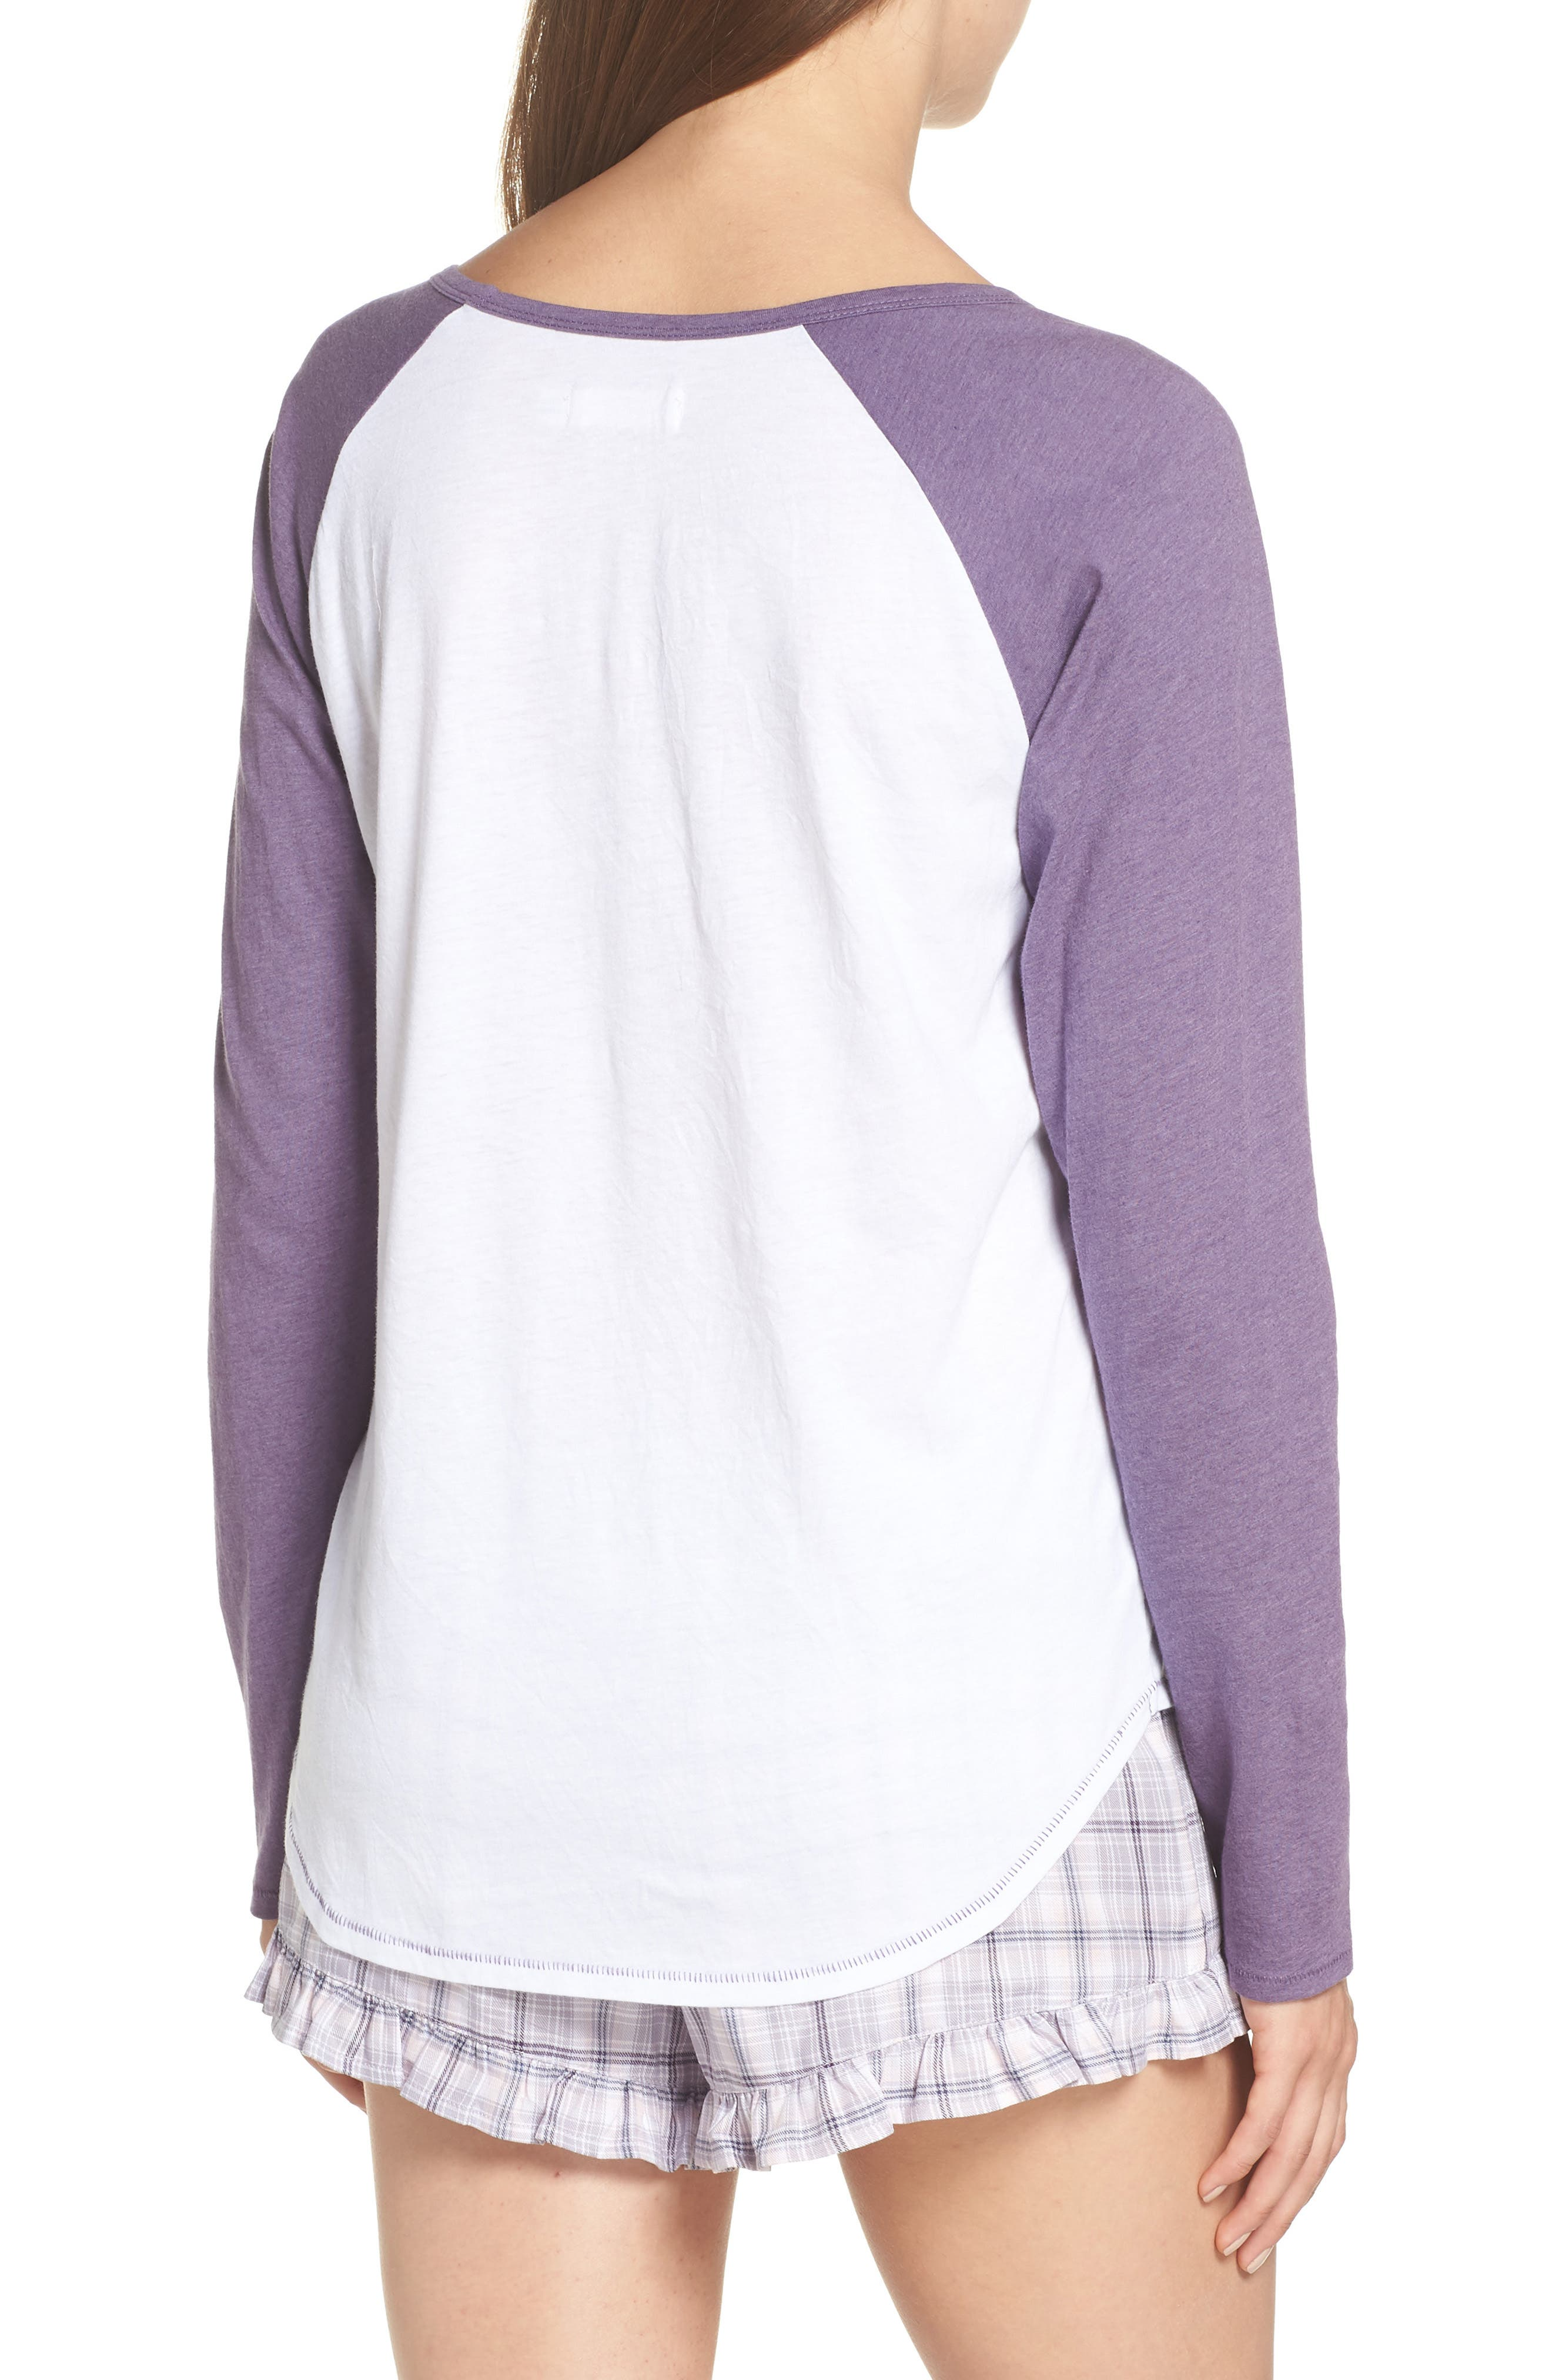 Charly Short Pajamas,                             Alternate thumbnail 2, color,                             LAVENDER AURA PLAID